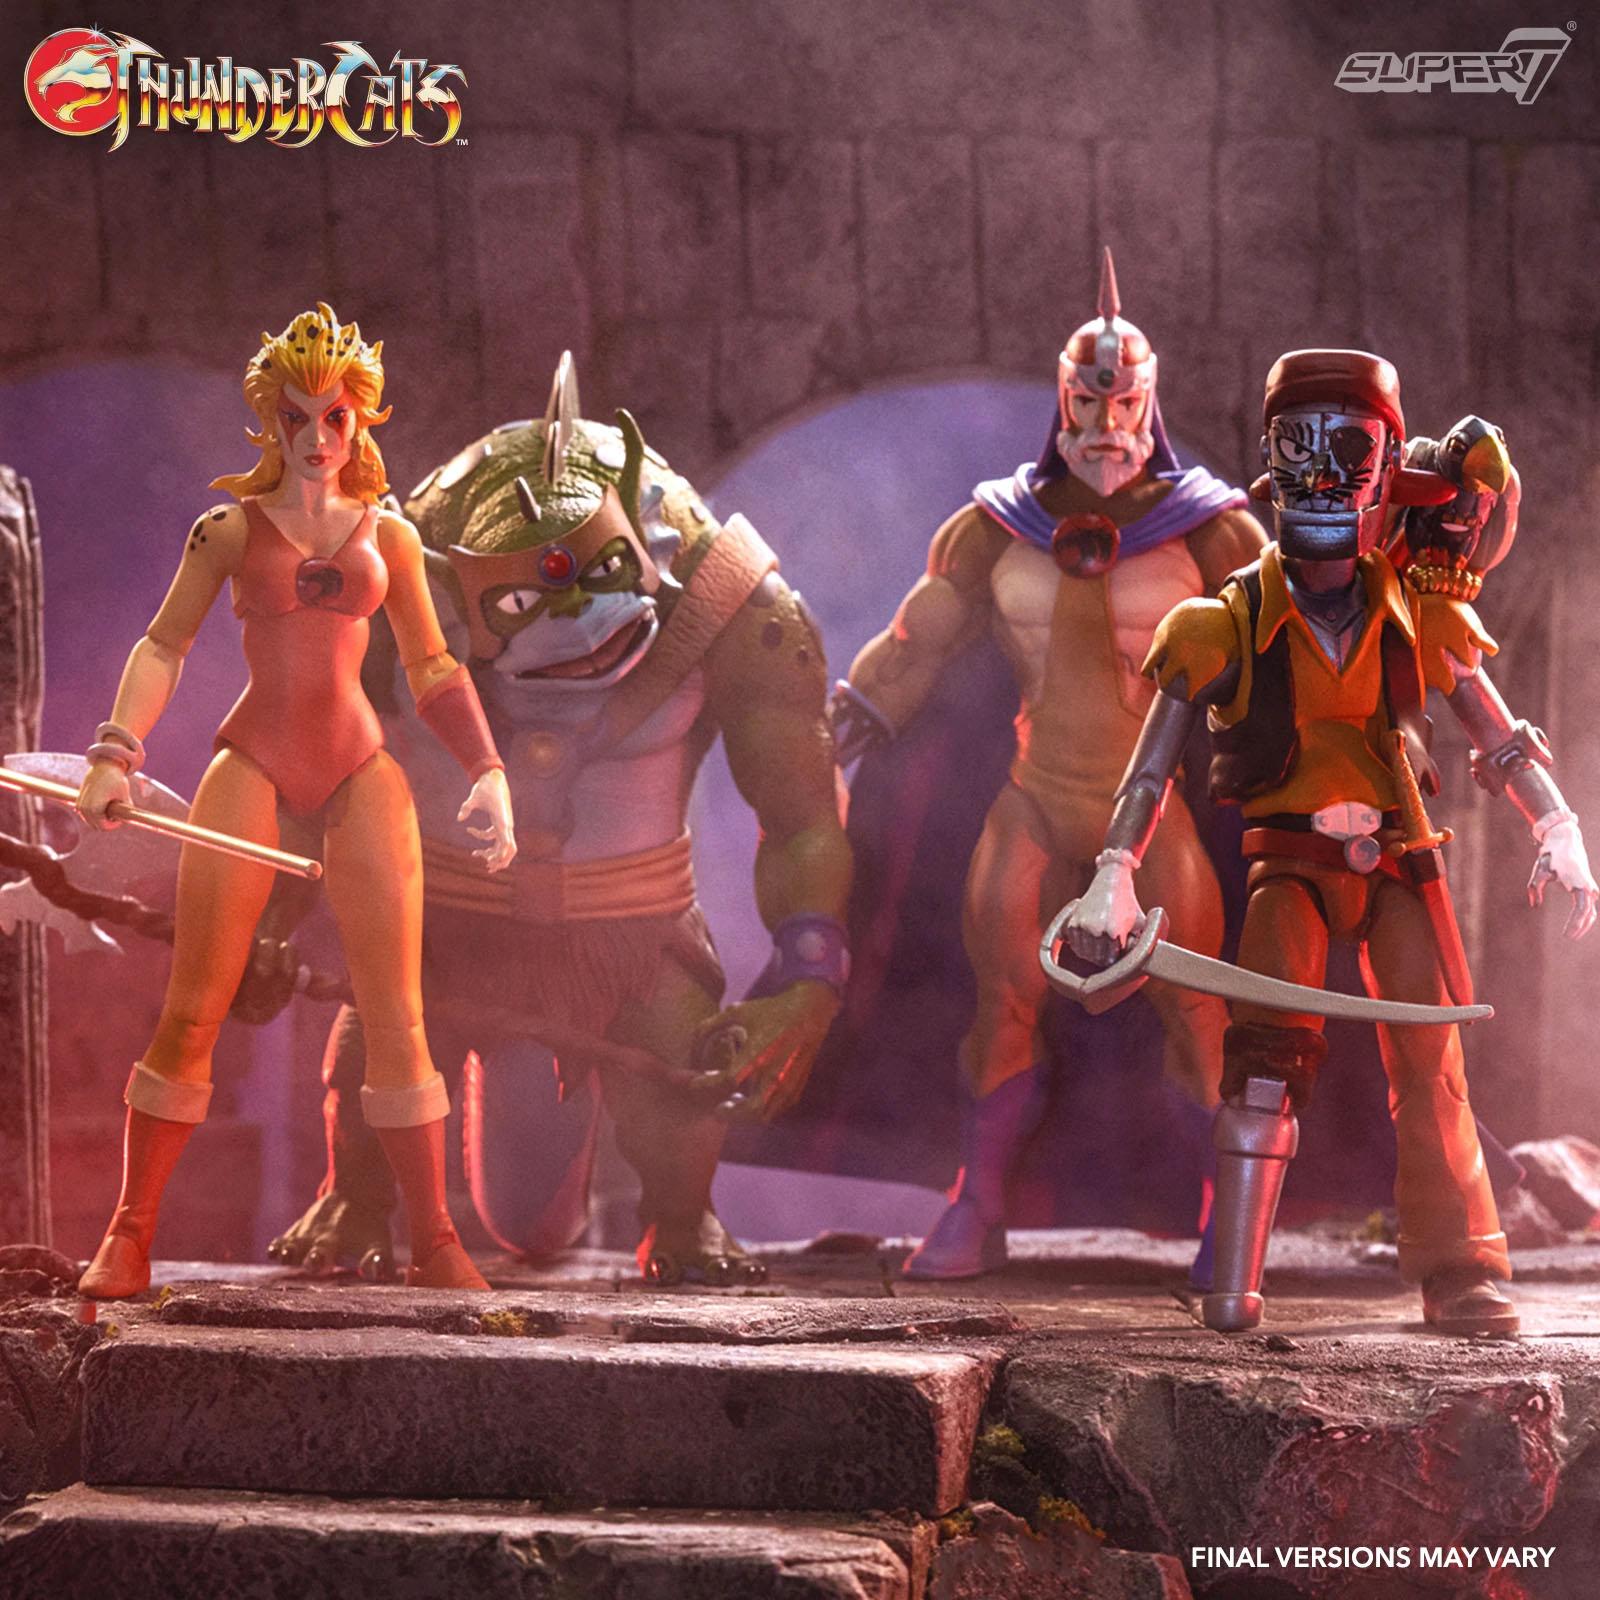 Thundercats-Ultimates-Wave-3-Figures-001